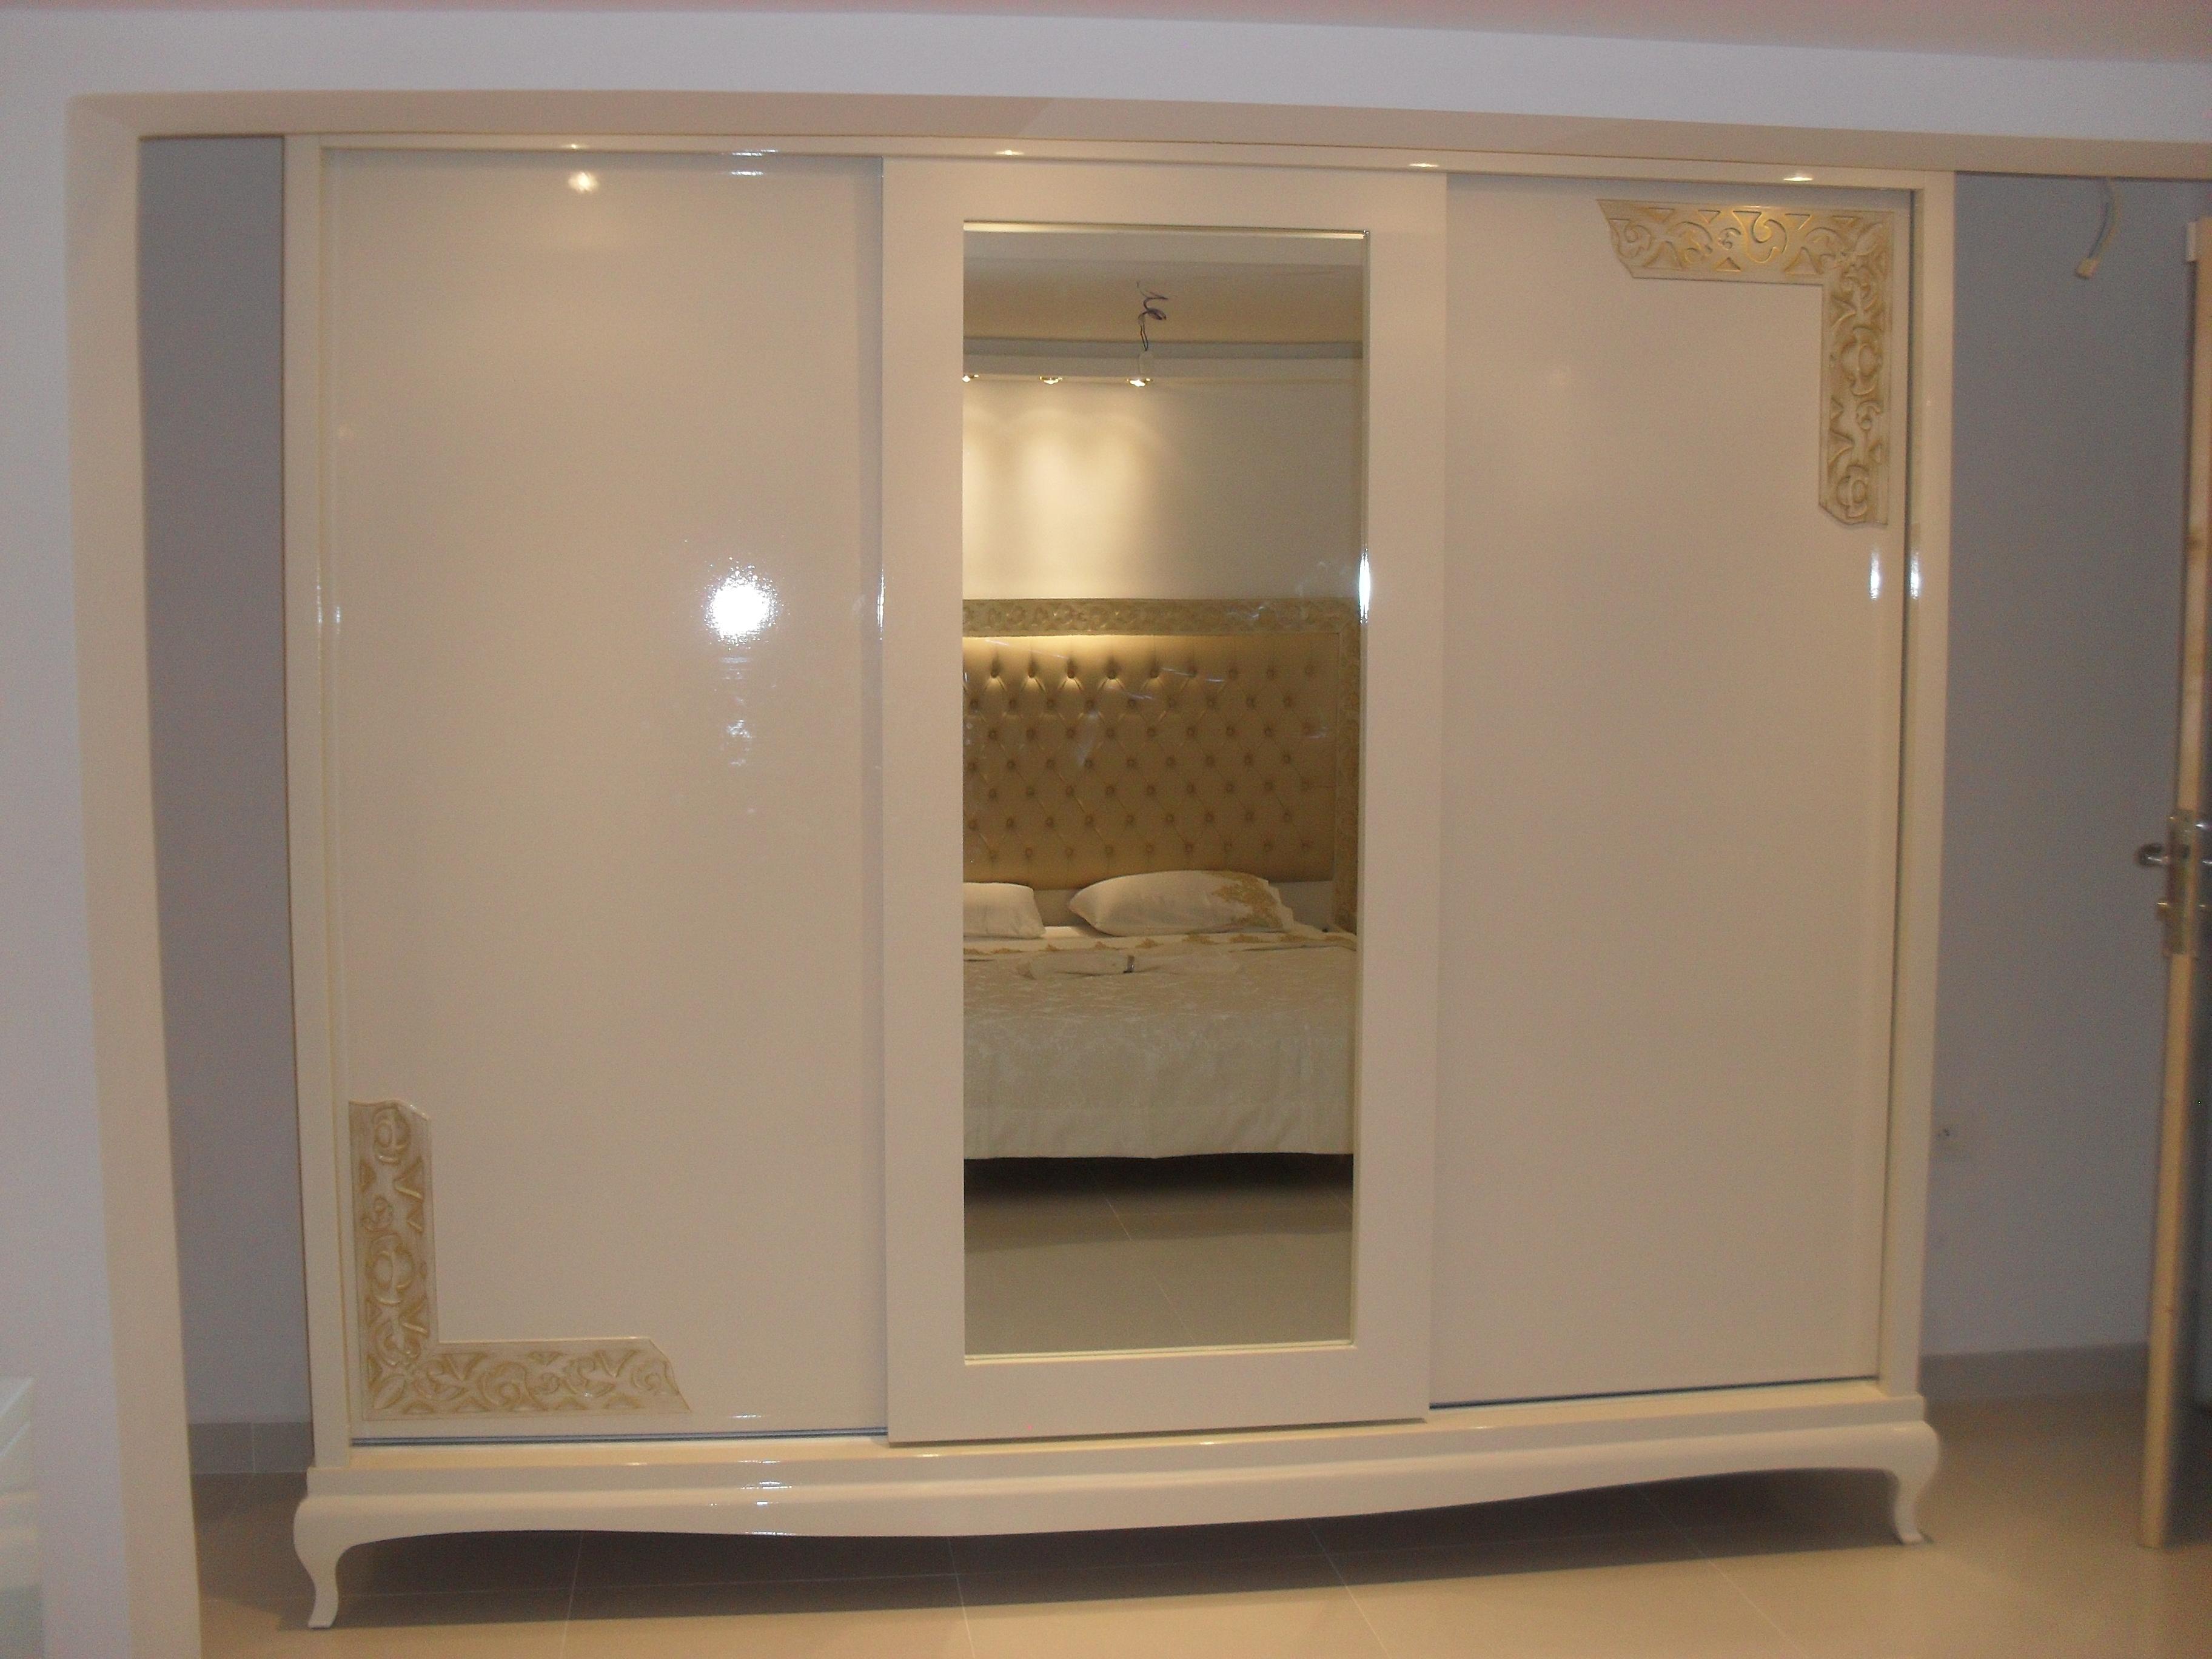 Chamber coucher chahd meubles et d coration tunisie for Meuble chambre a coucher en tunisie